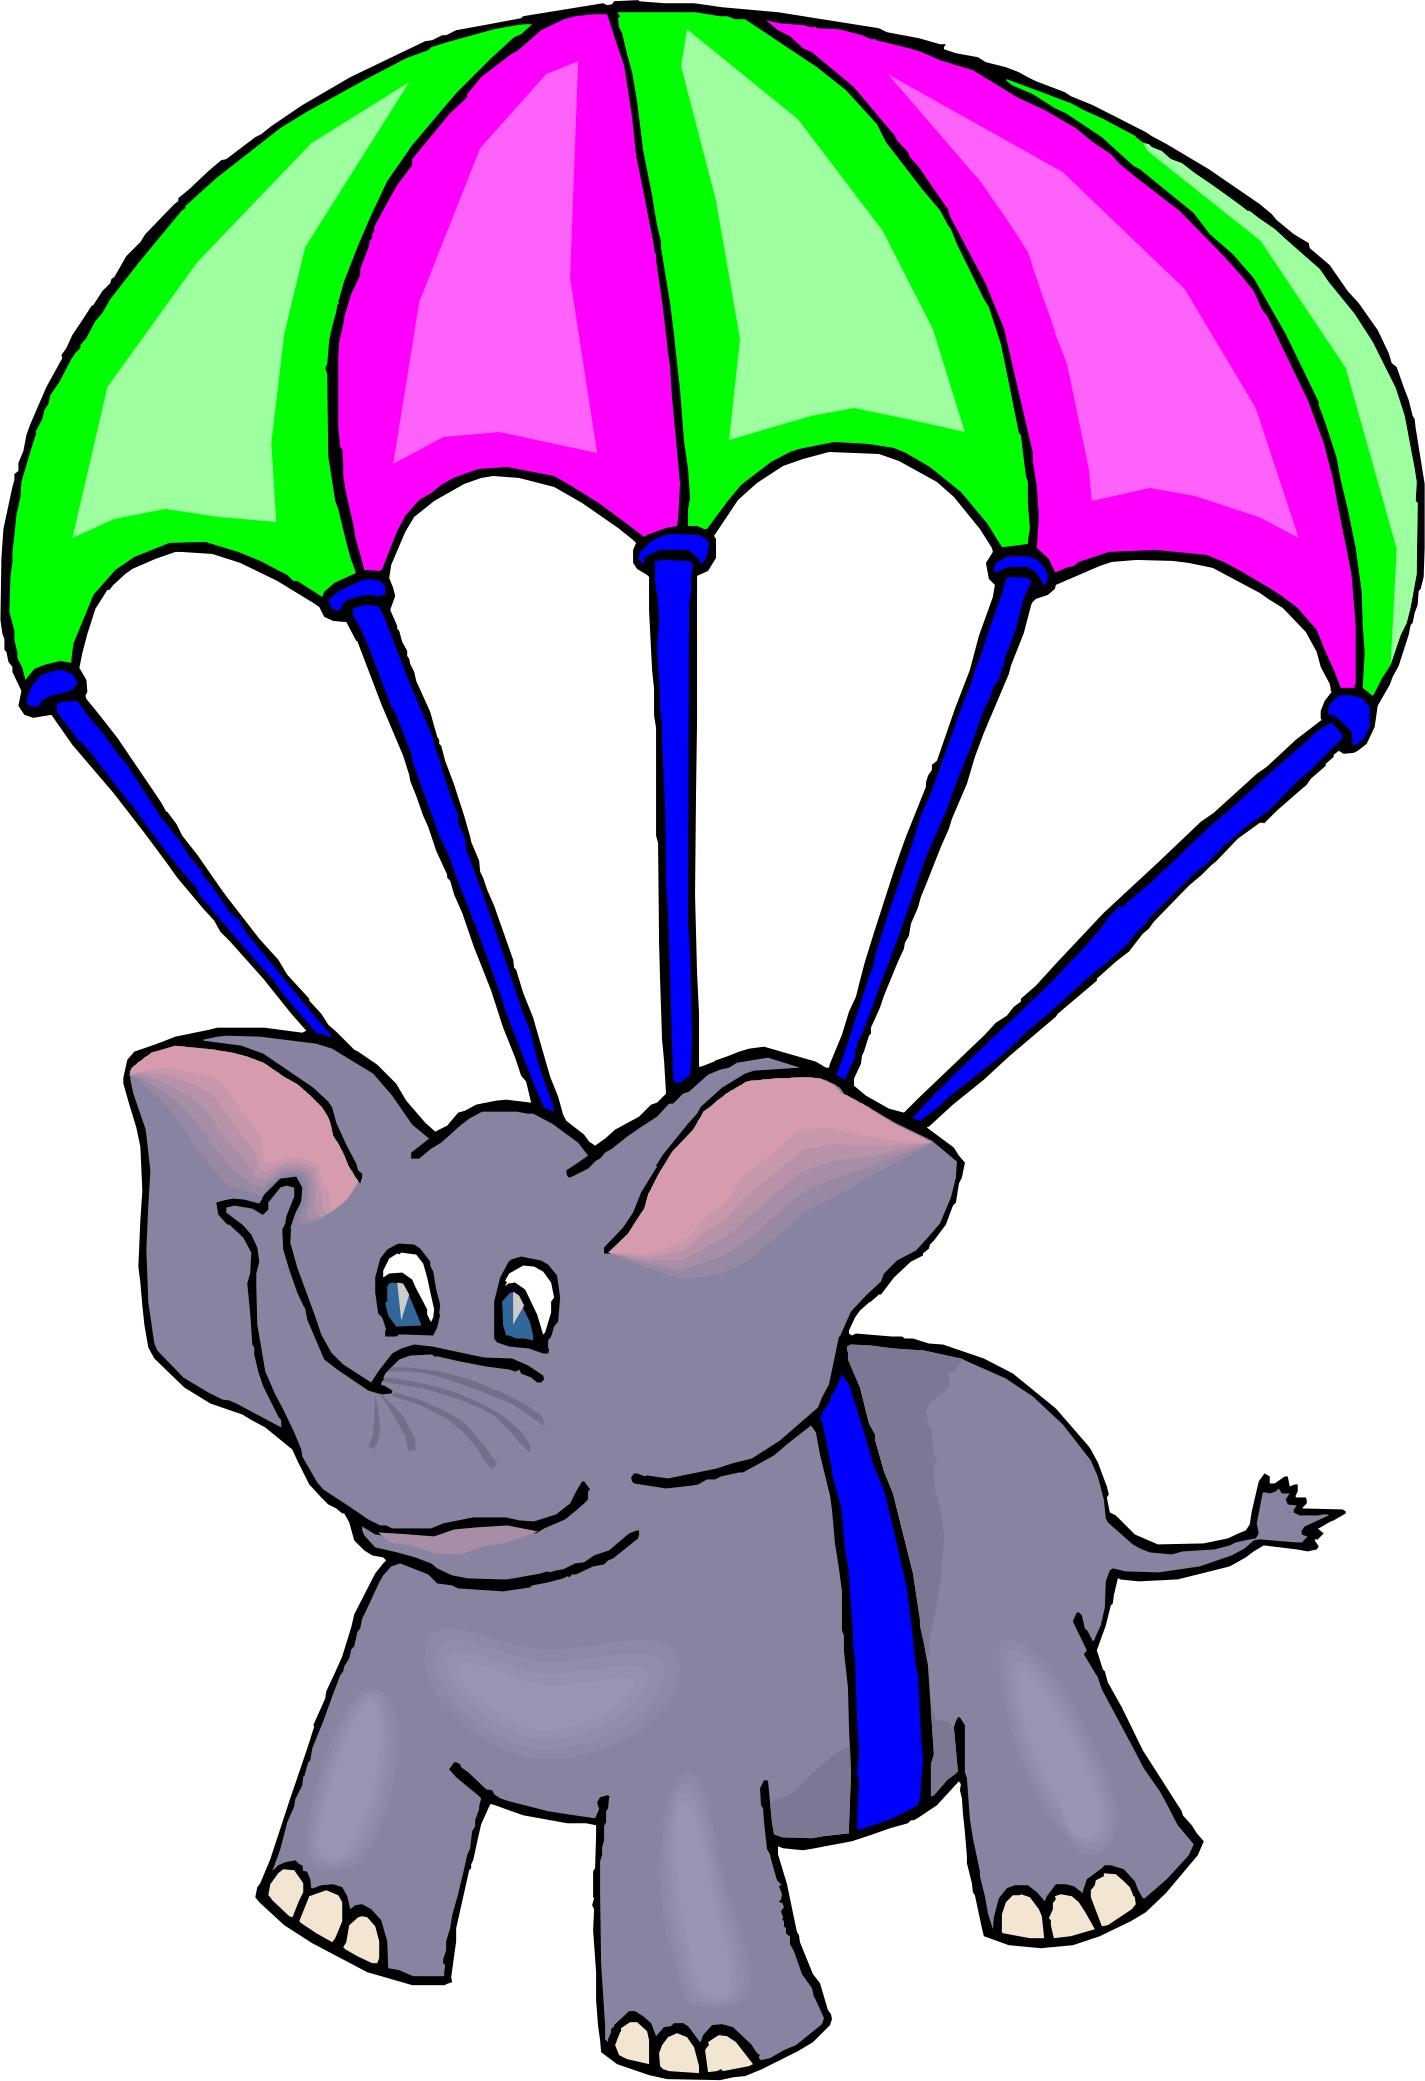 Skydiving clipart cute Clipart Inspiration Art Parachute Parachute